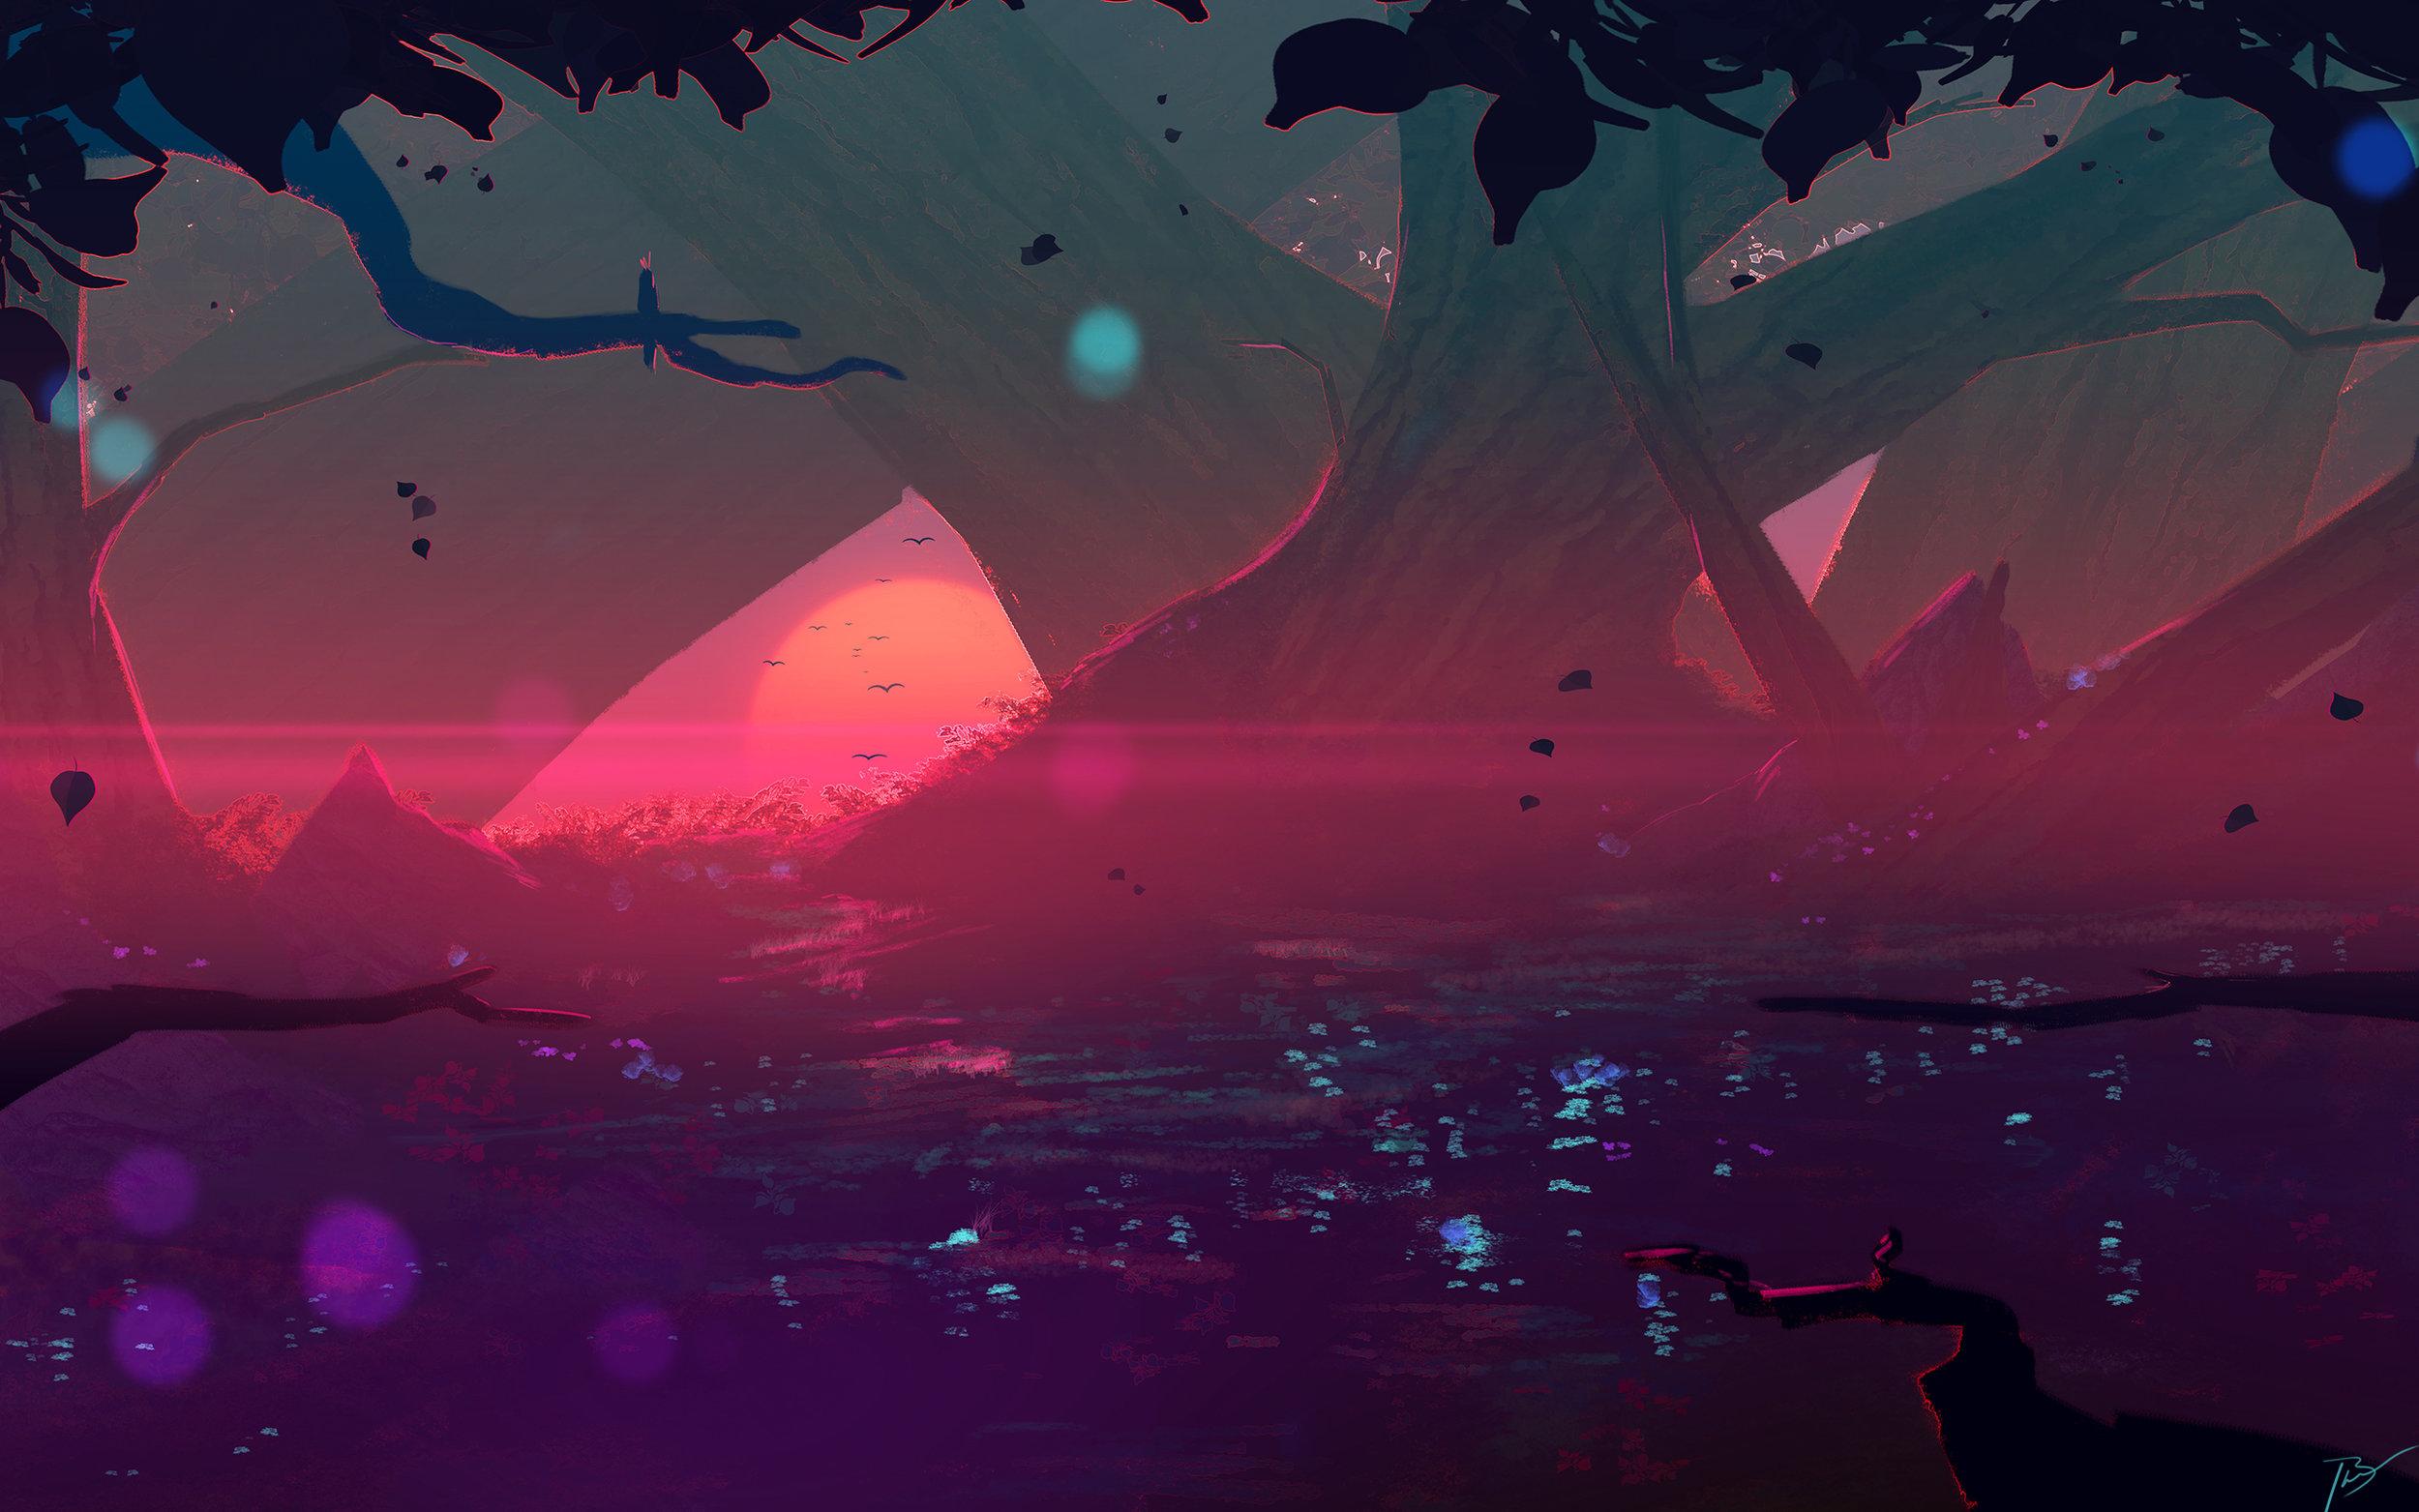 Artist:  Josef Bartoň  Sourced:  http://bit.ly/2VV4IFa